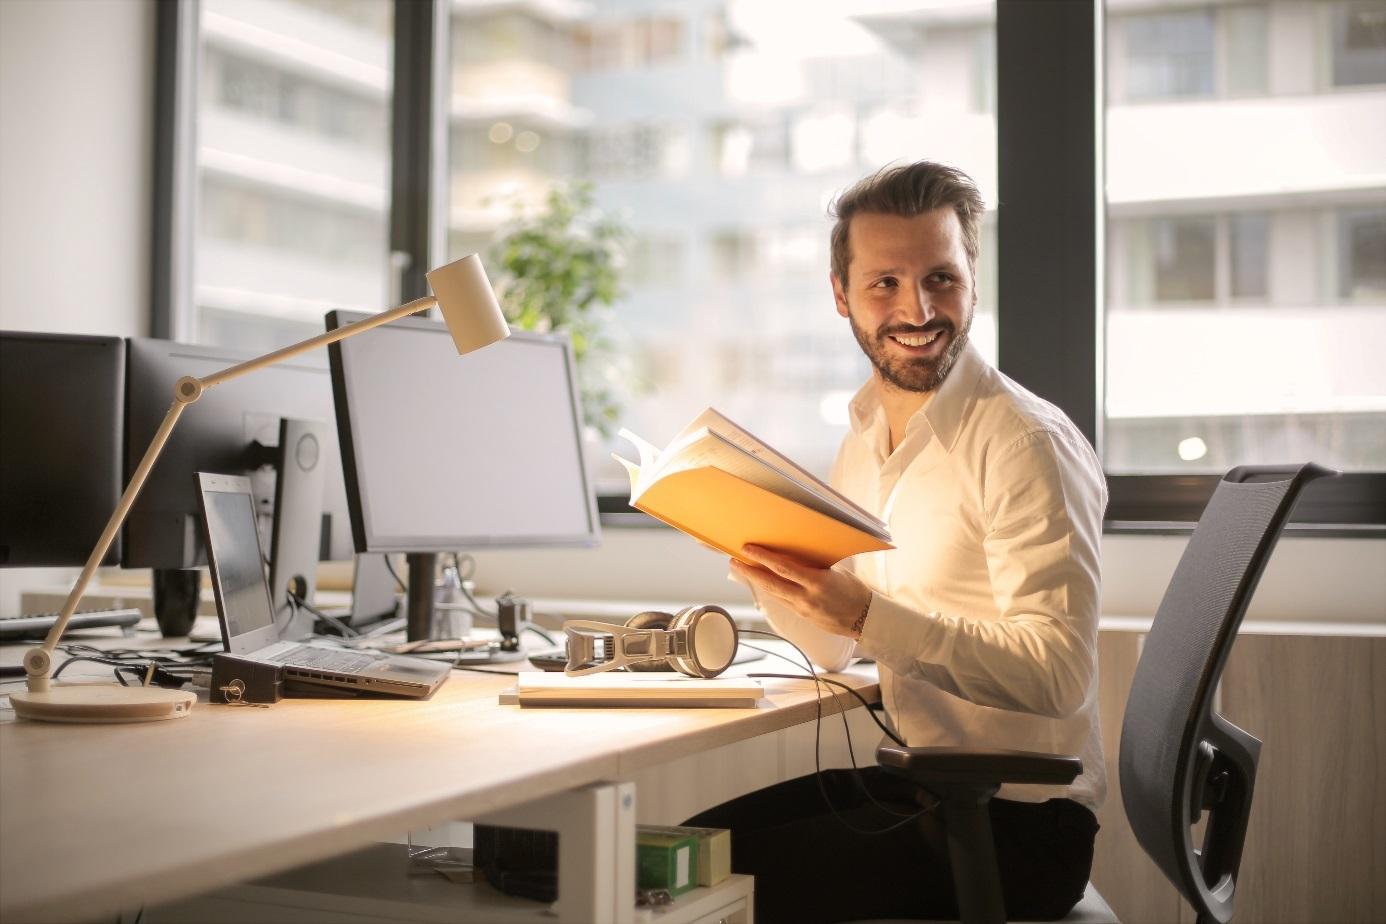 Junger Mann am Schreibtisch